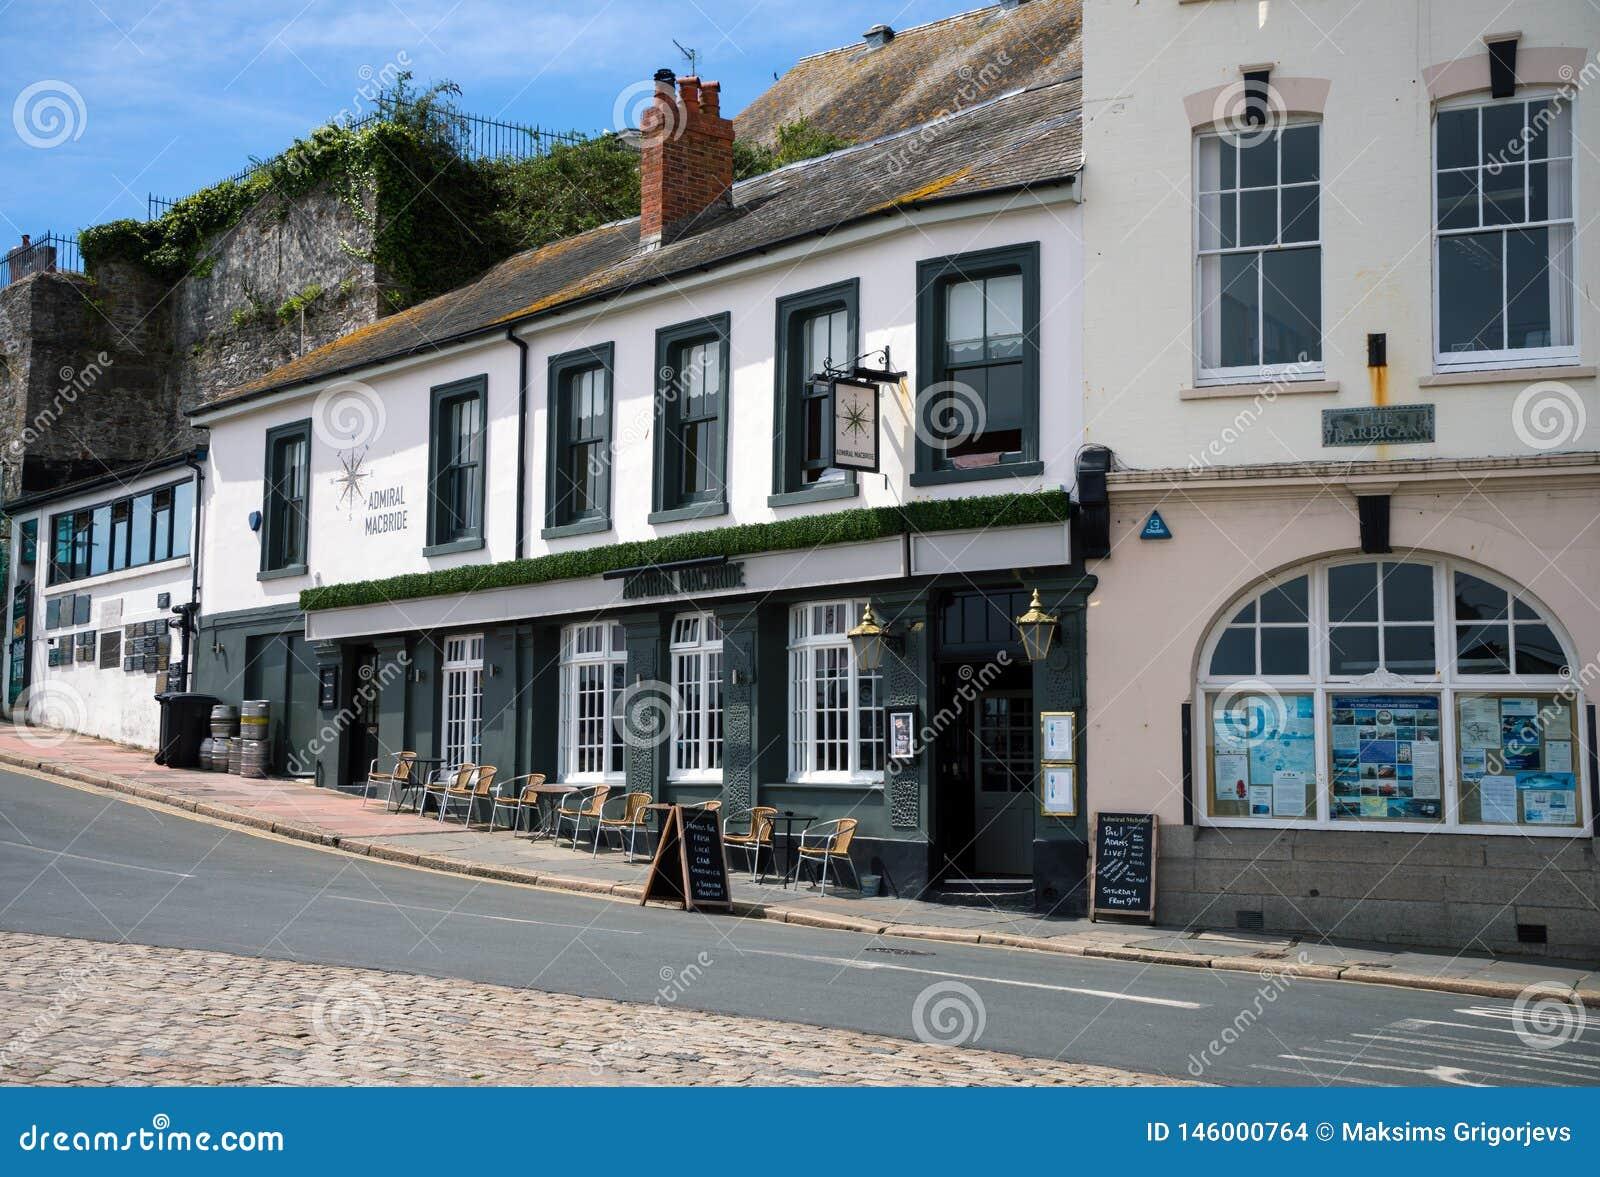 Bar em Plymouth, o Barbican do almirante Macbride, Devon, Reino Unido, o 23 de maio de 2018